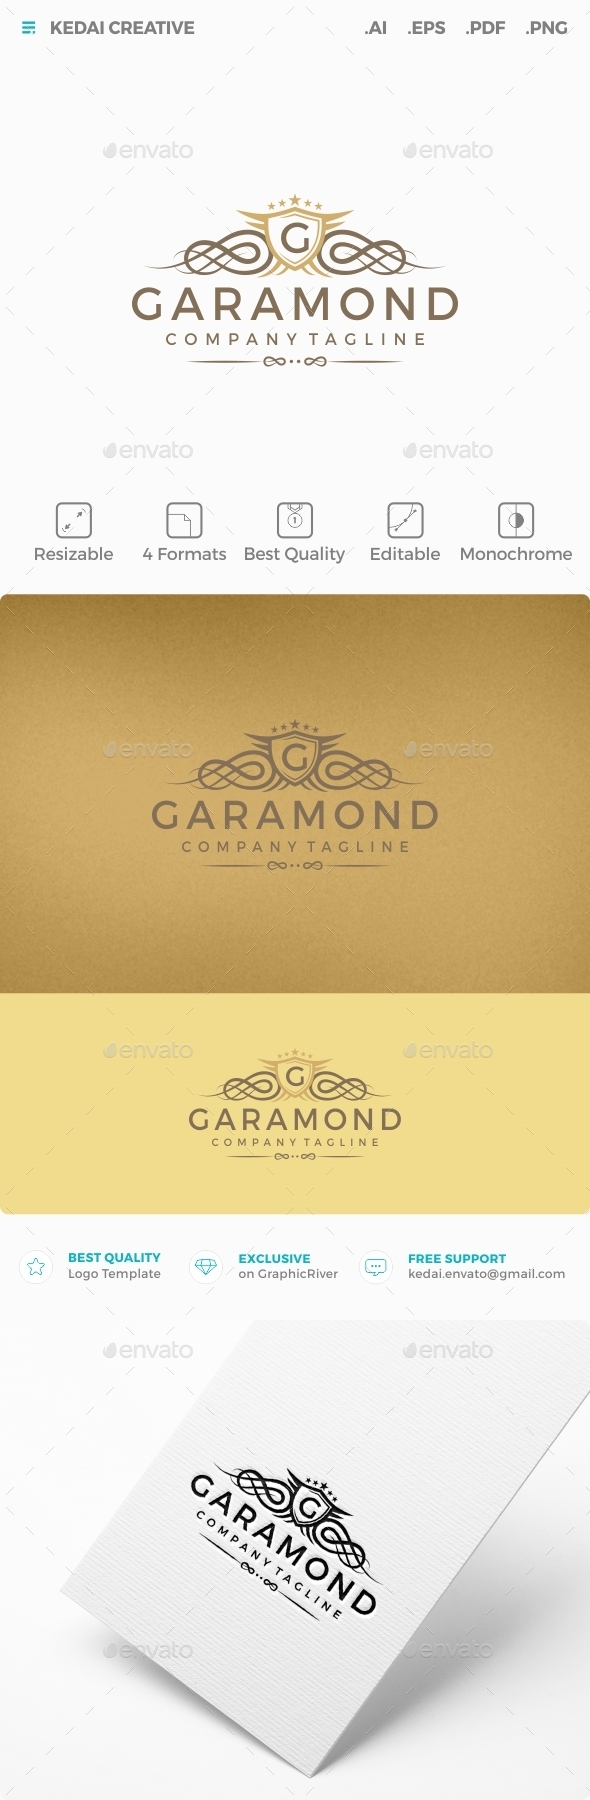 Garamond - Crests Logo Templates